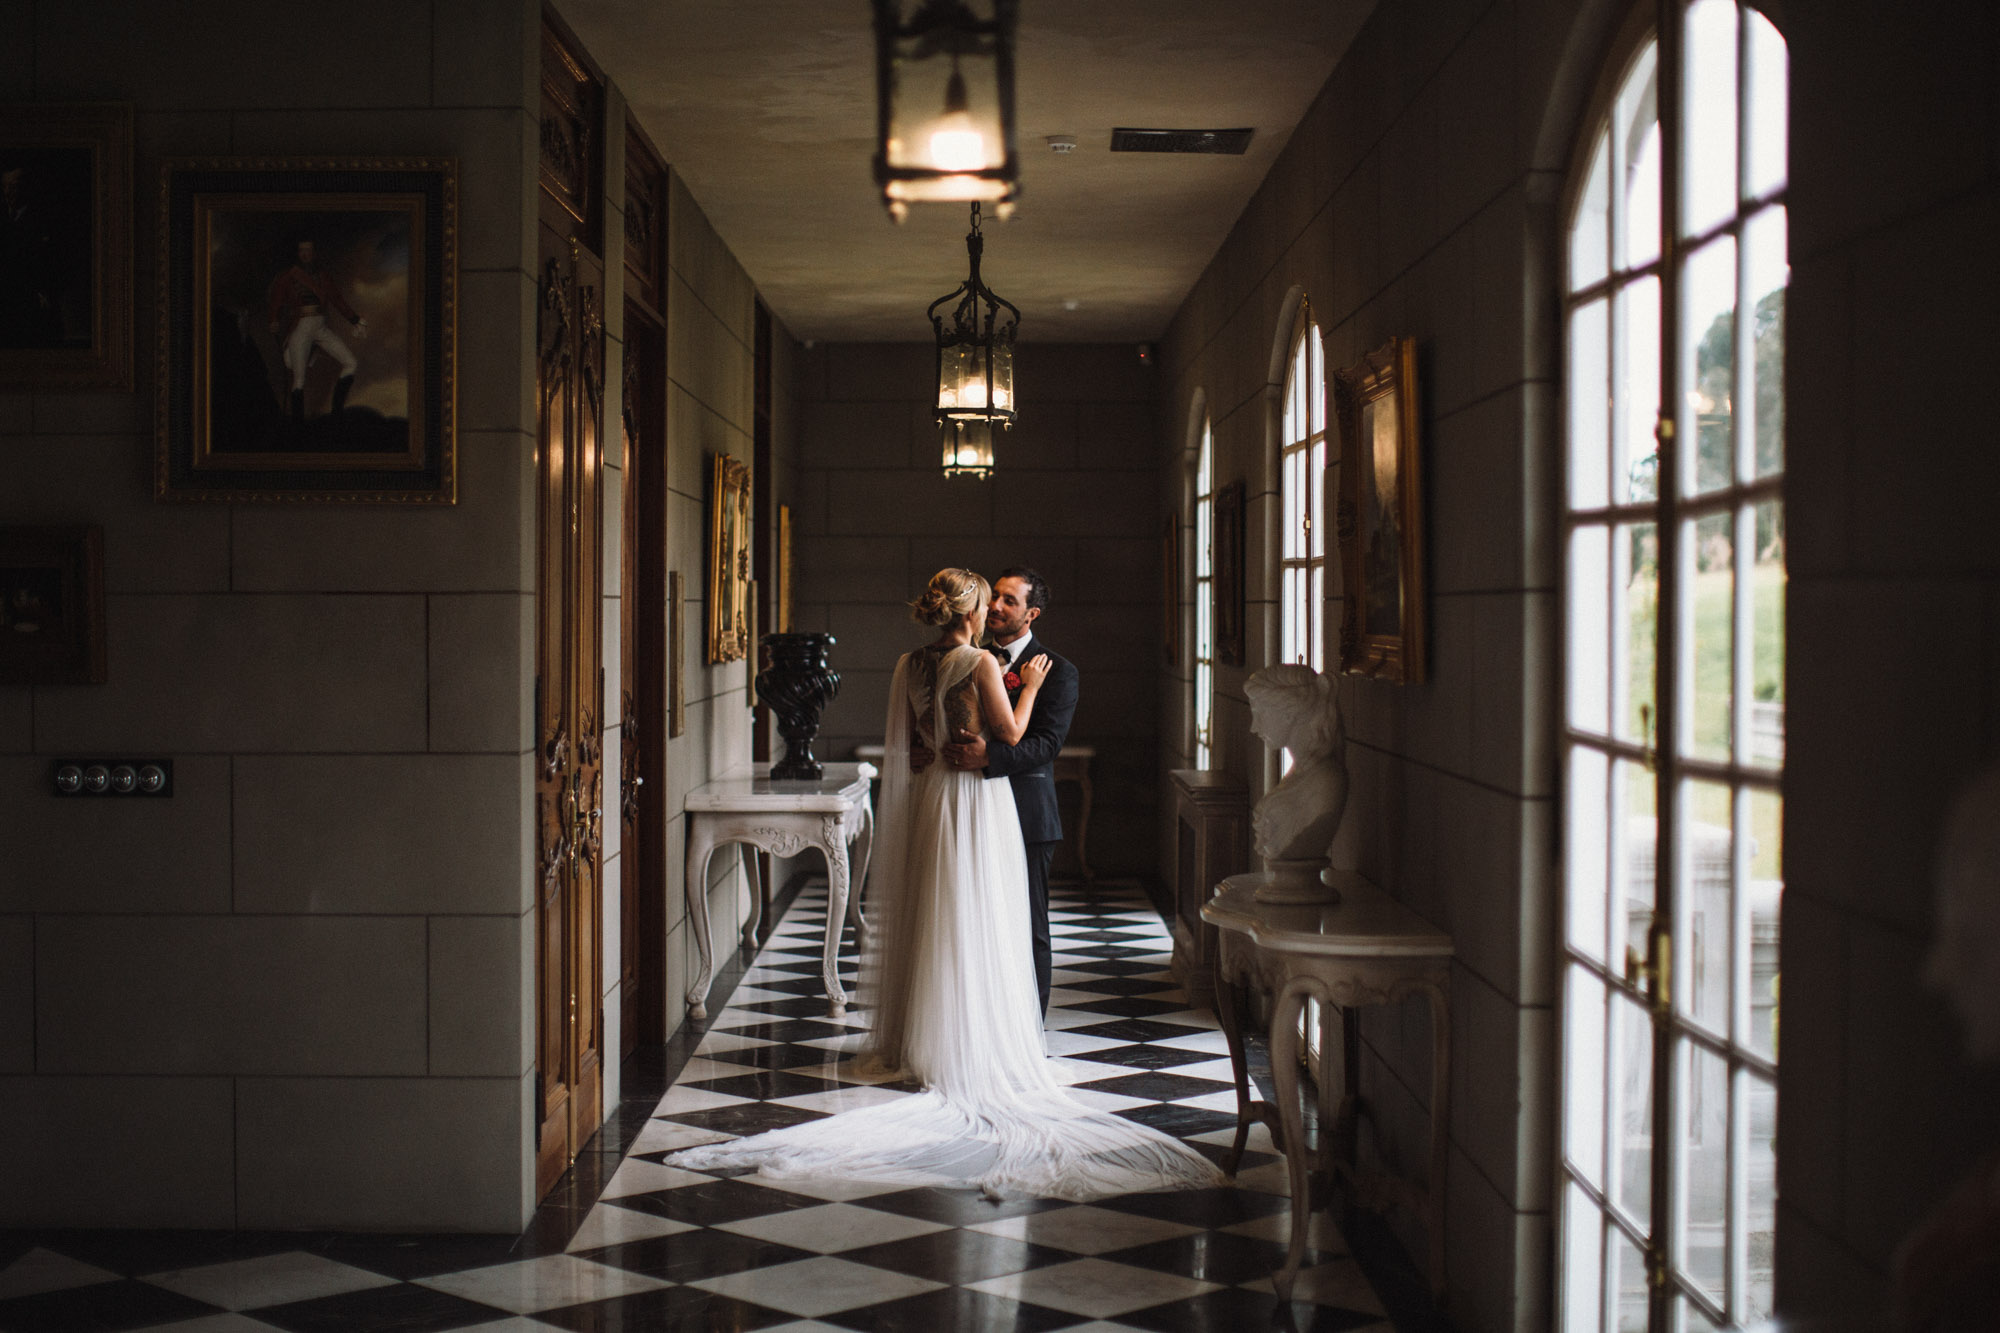 Campbell Point House Wedding HJ + Dean Raphael Weddings-110.jpg